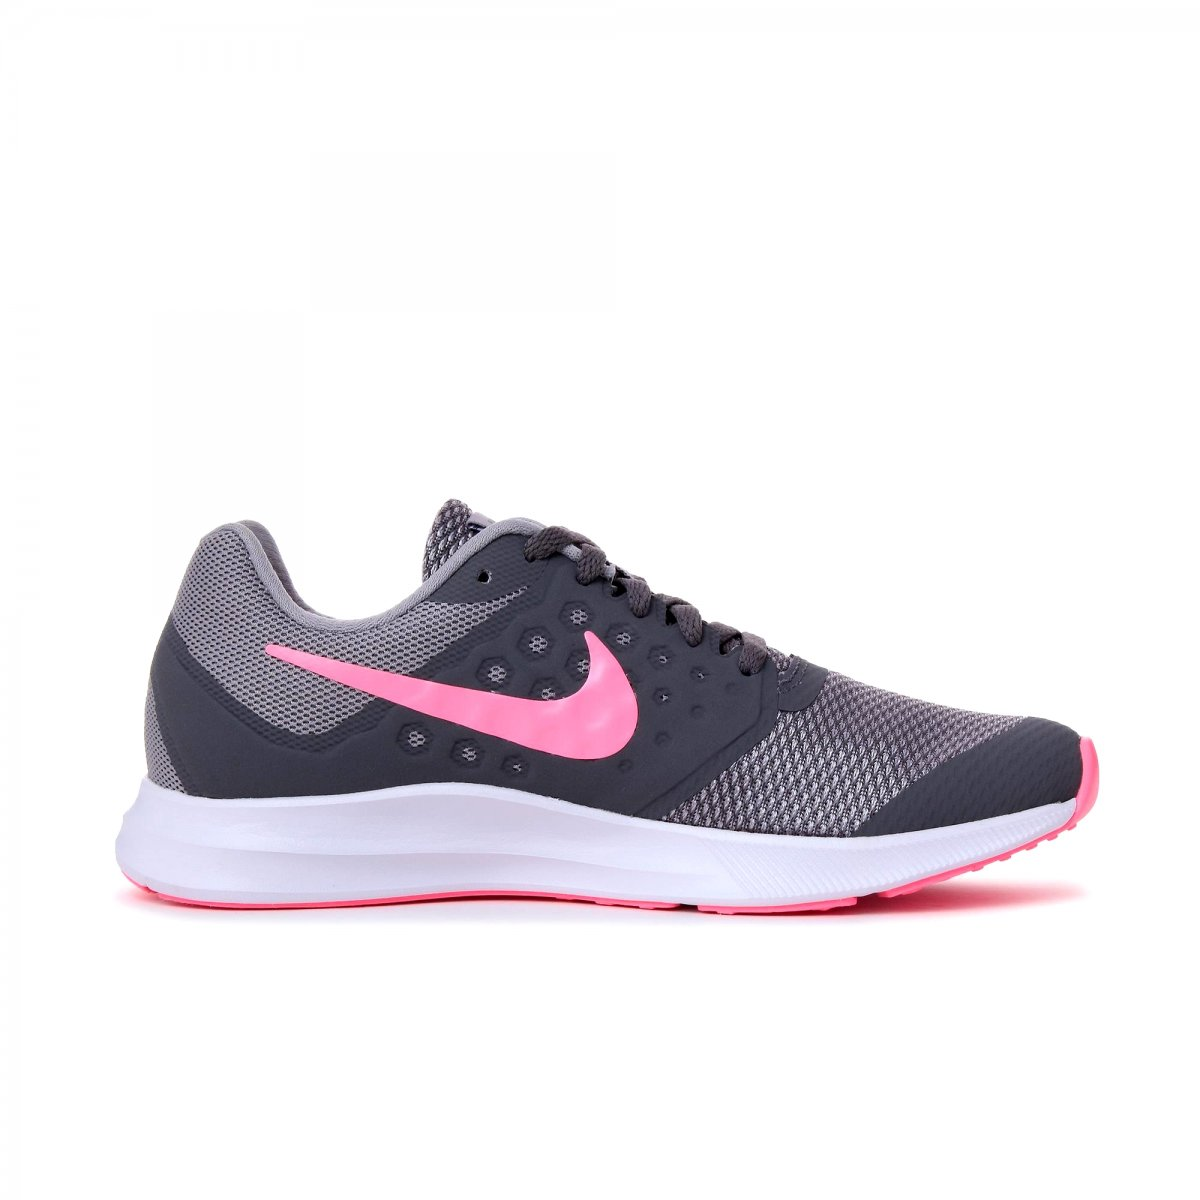 bdd2c4419 Tênis Nike Downshifter 7 (GS) Infantil 869972-003 - Cinza Rosa ...